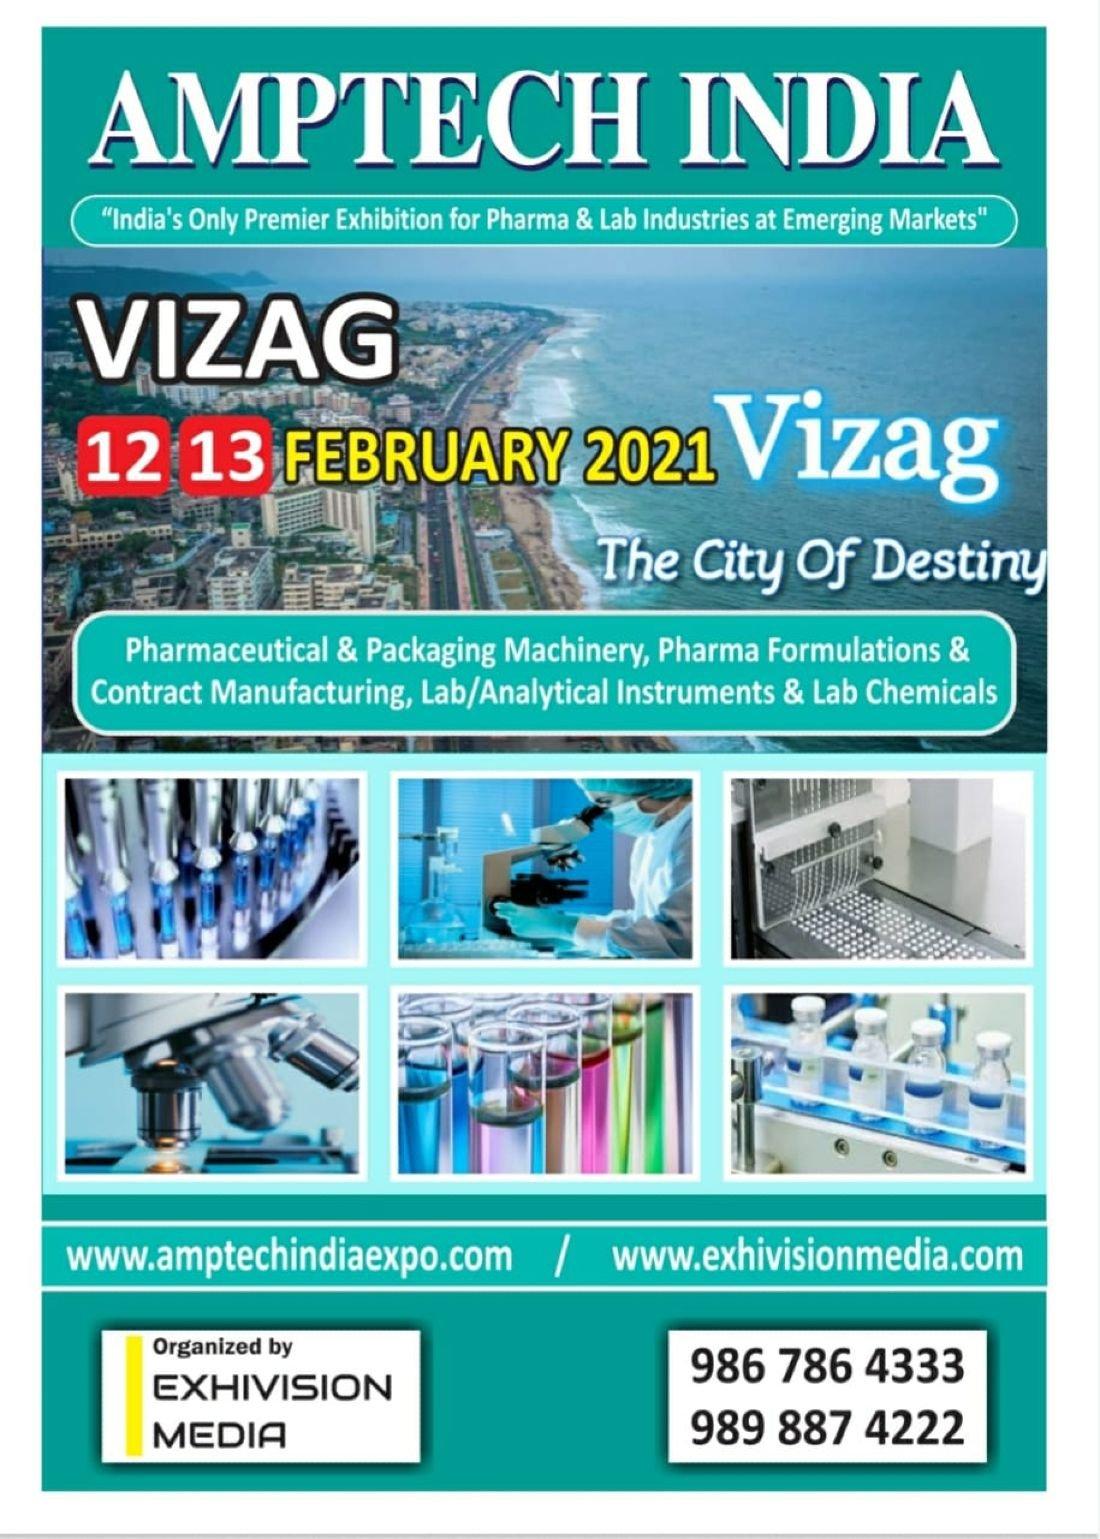 AMPTECH INDIA PHARMA & LAB EXPO - VIZAG